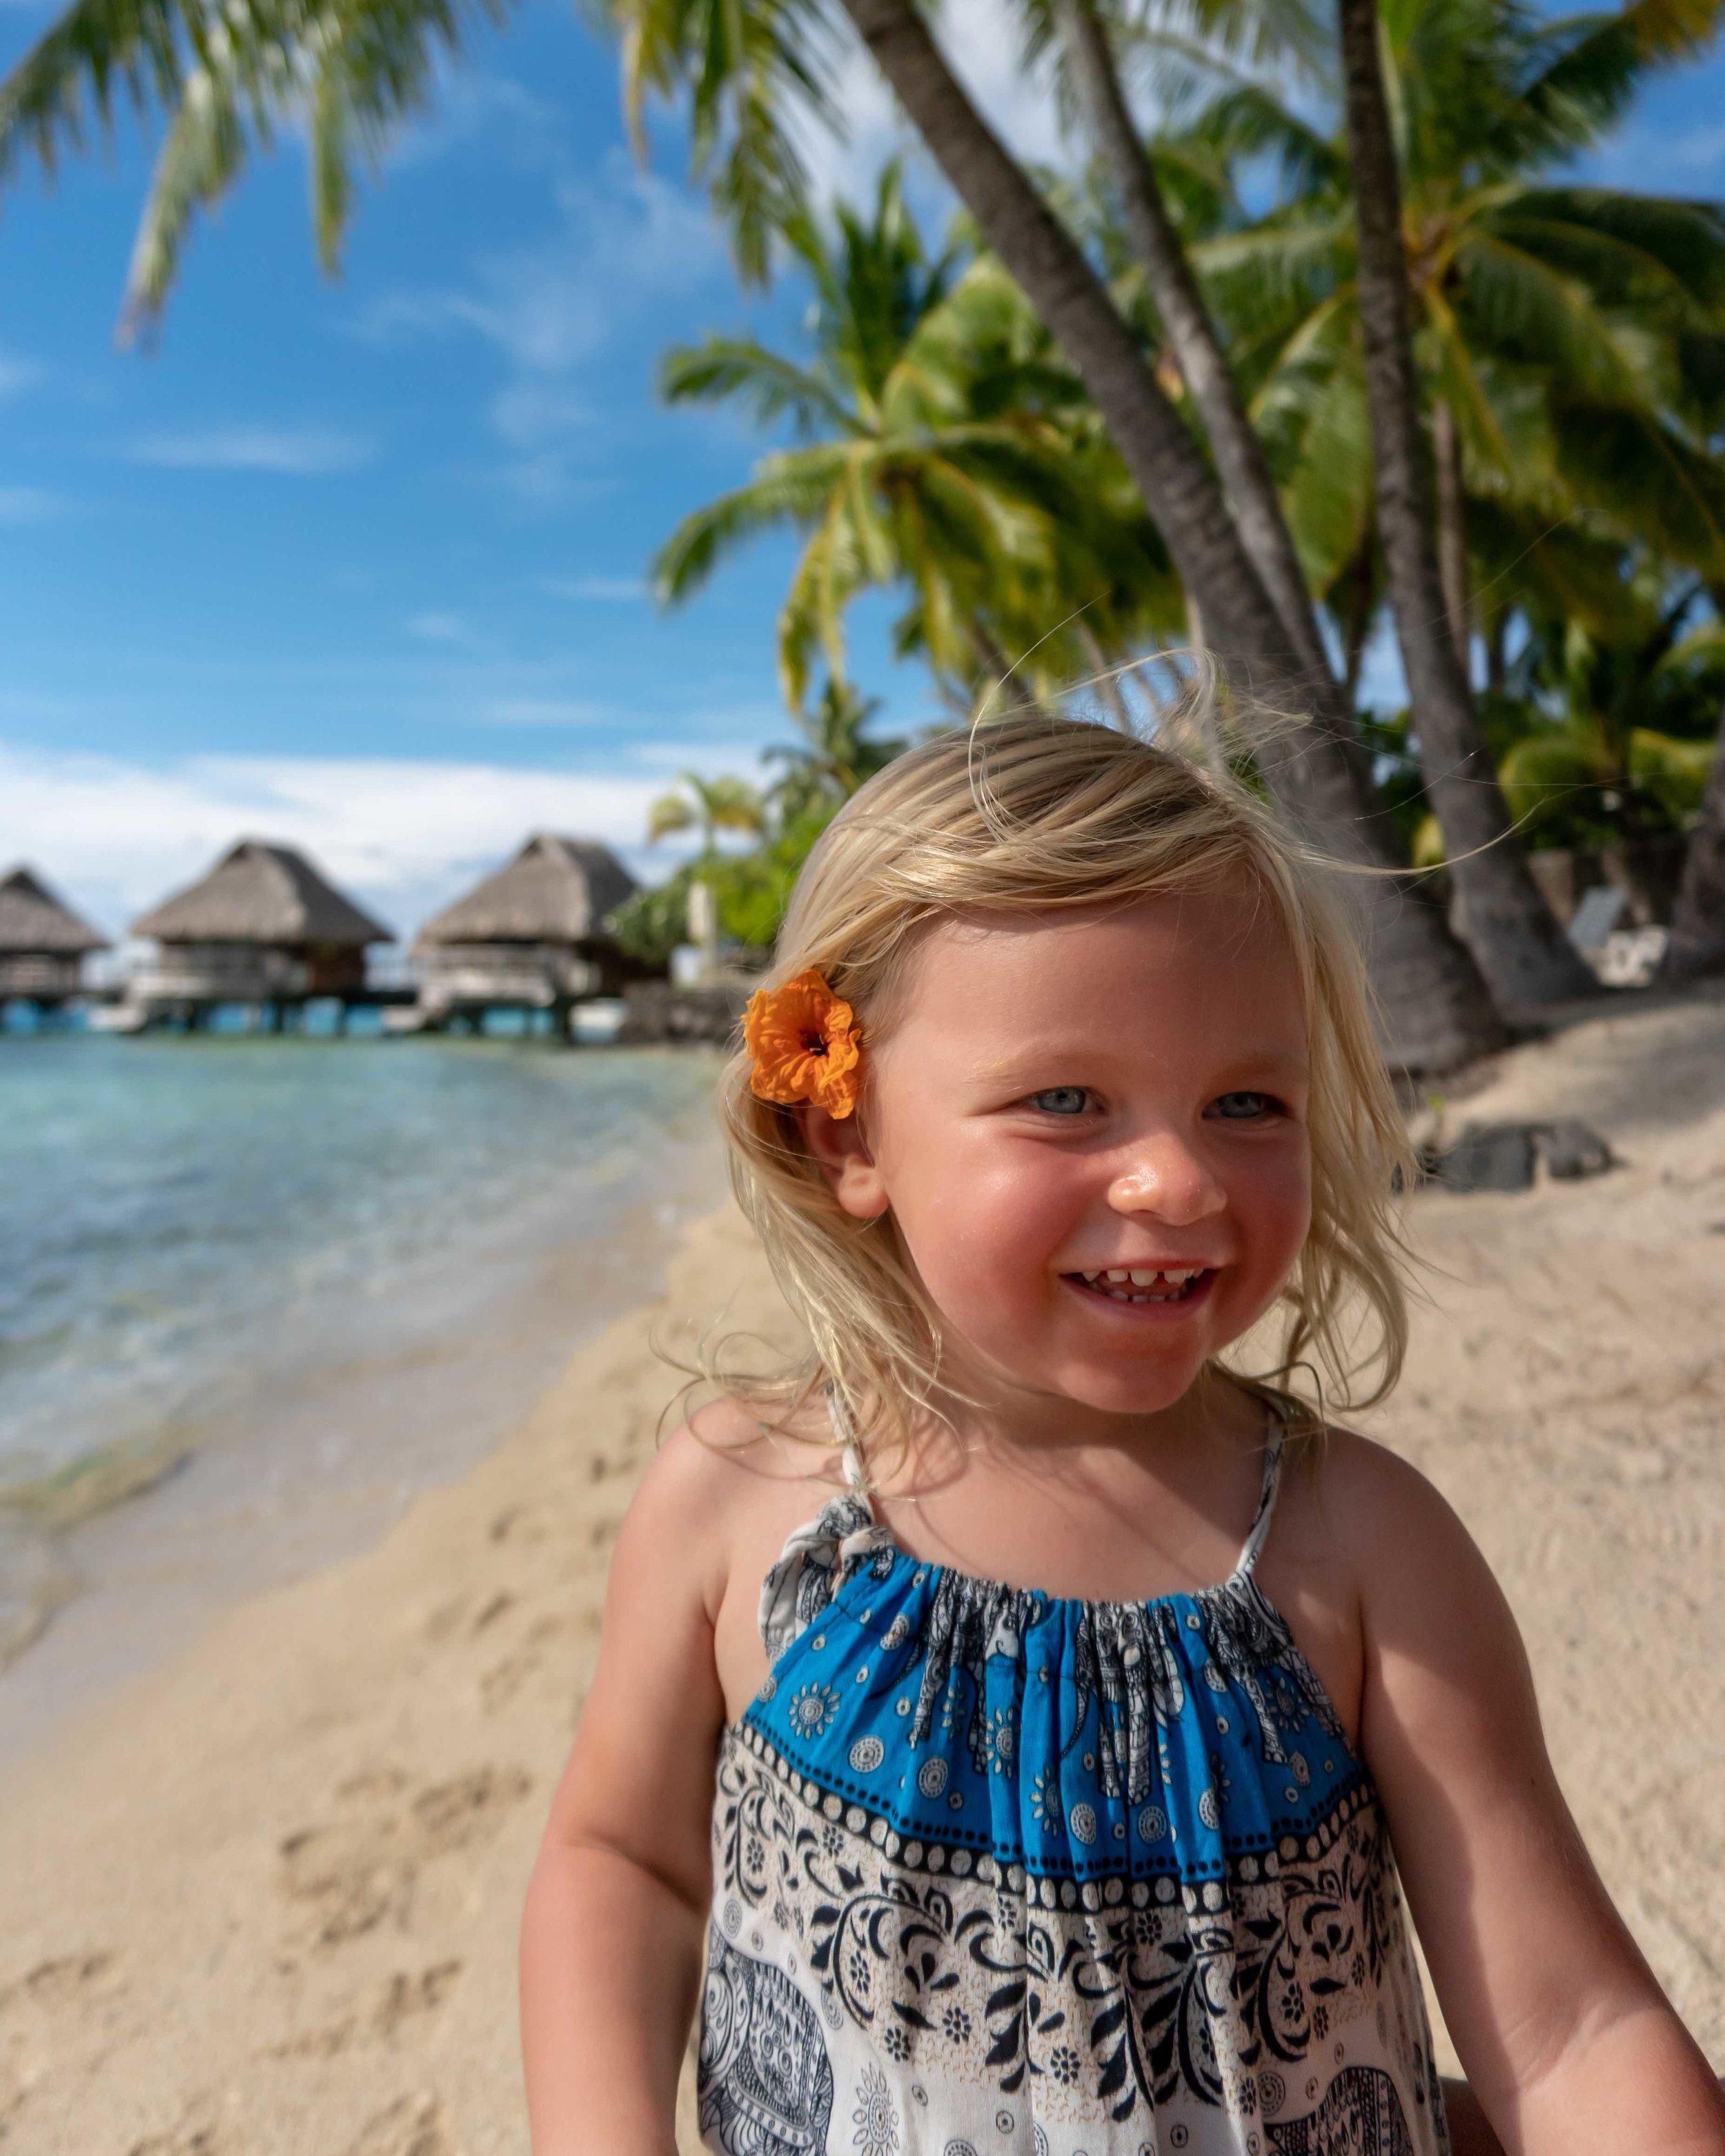 lifestyle_beach_bora bora_maintai_girl_overwater bungalows_flower.jpg